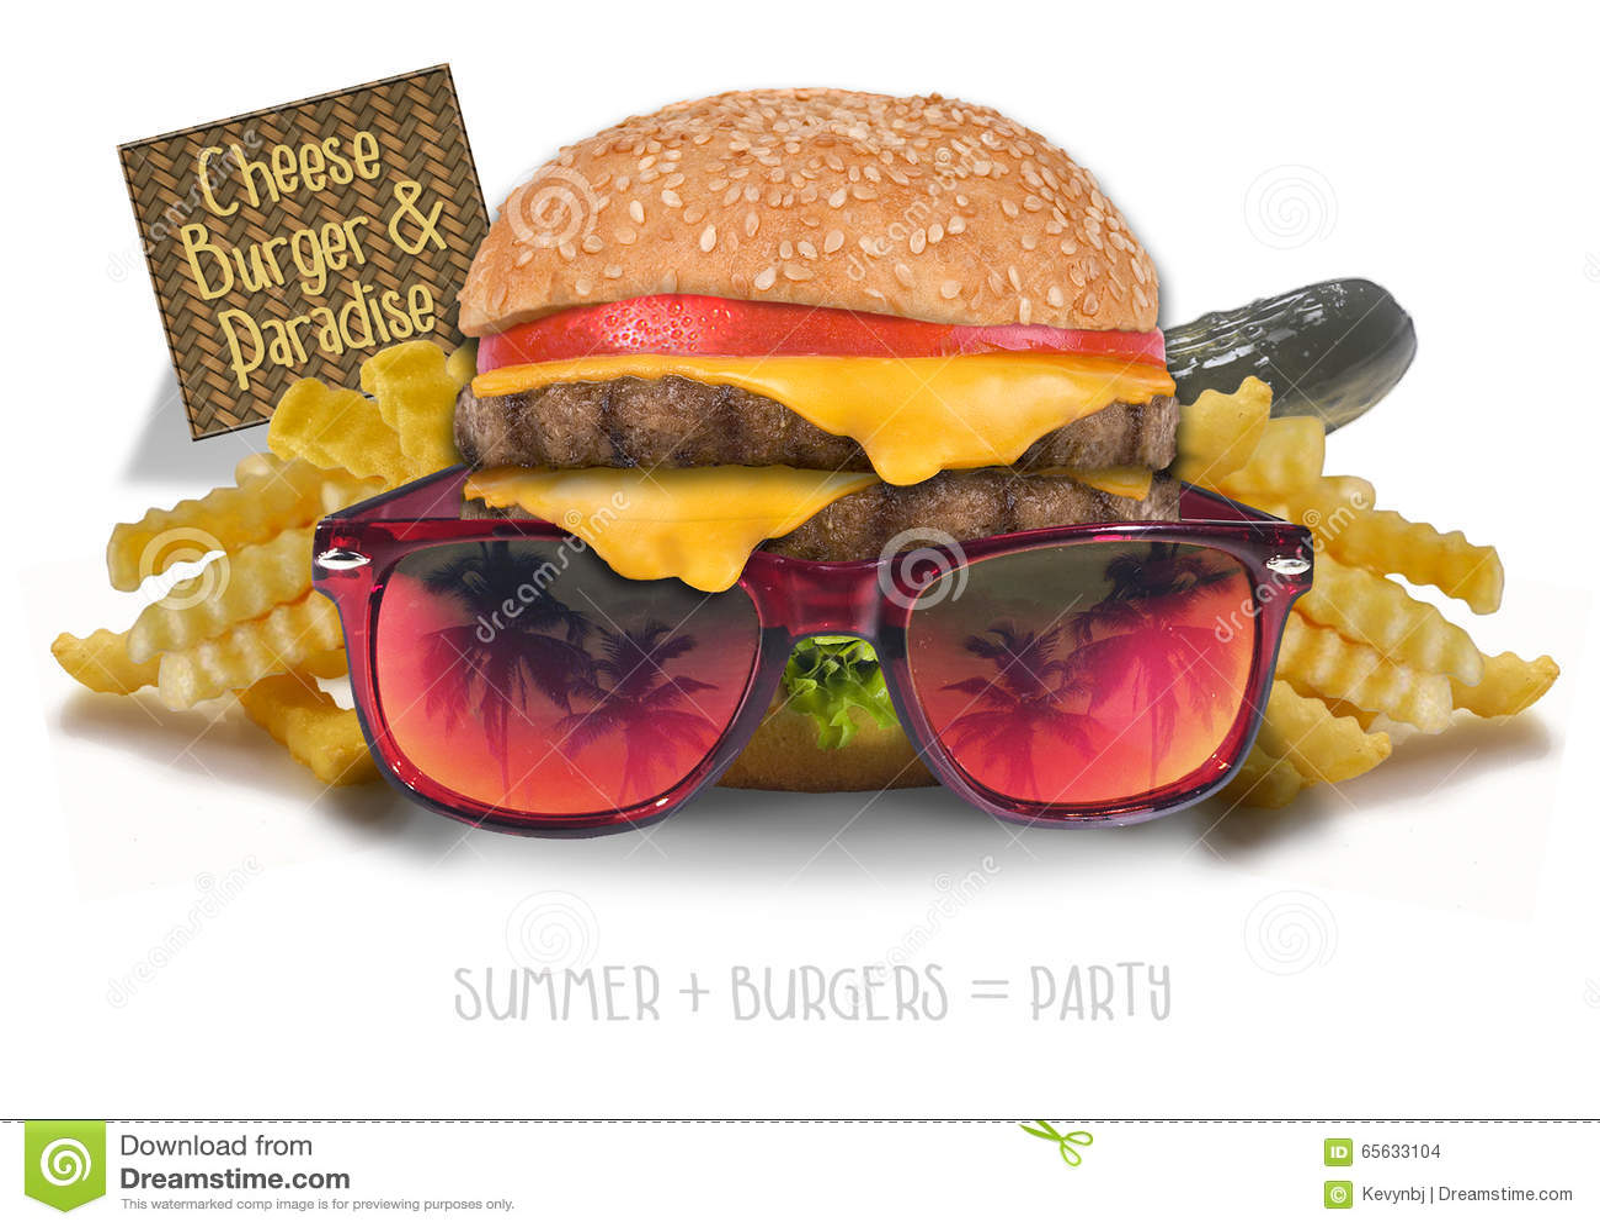 Cheeseburger dans le paradis